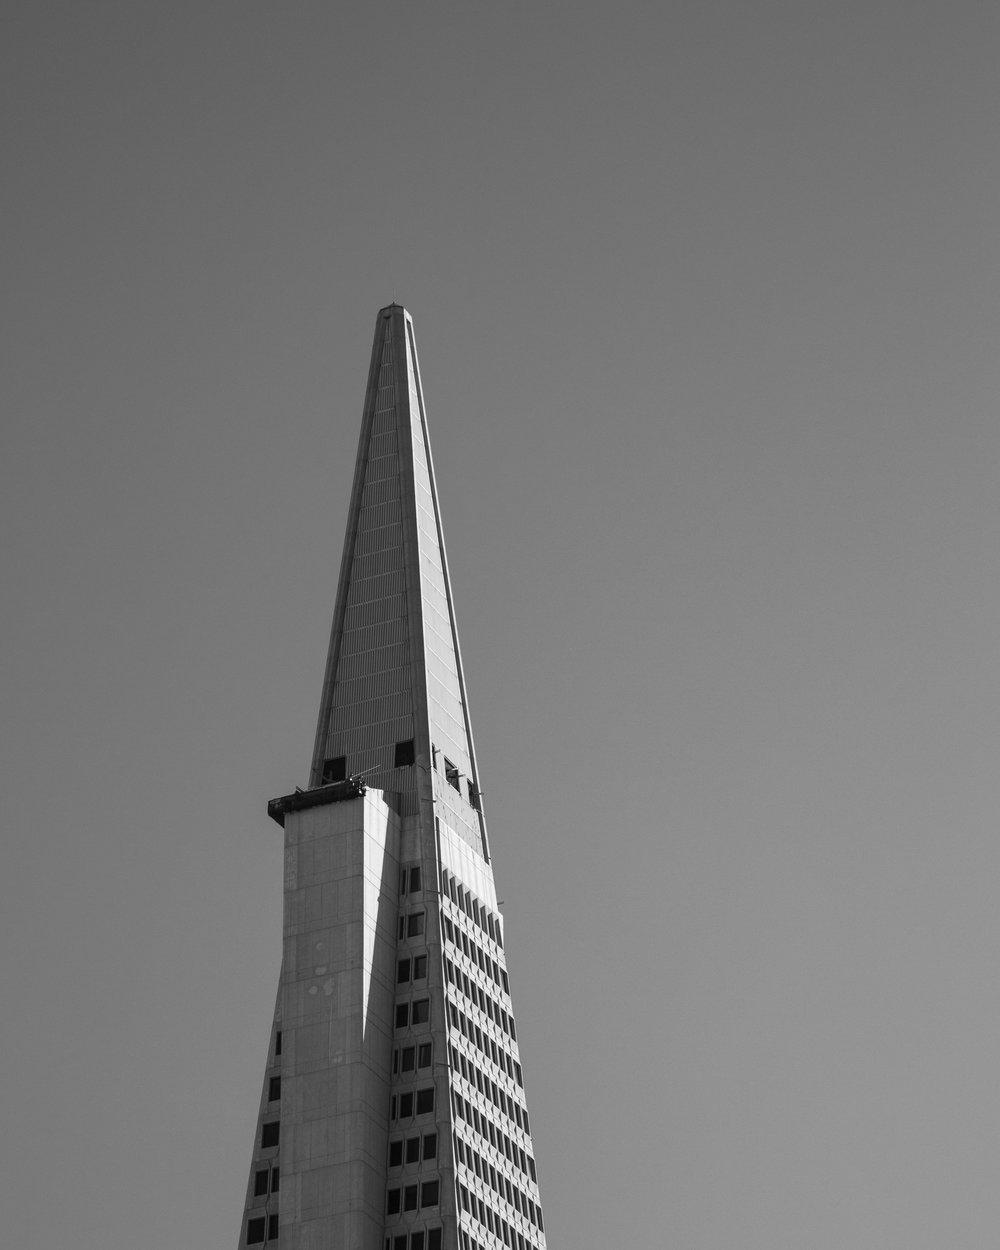 Transamerica Pyramid - San Francisco, CA -  Canon 5D Mark III - 24-105 f/4L - 1/500 - f/13 - ISO 320